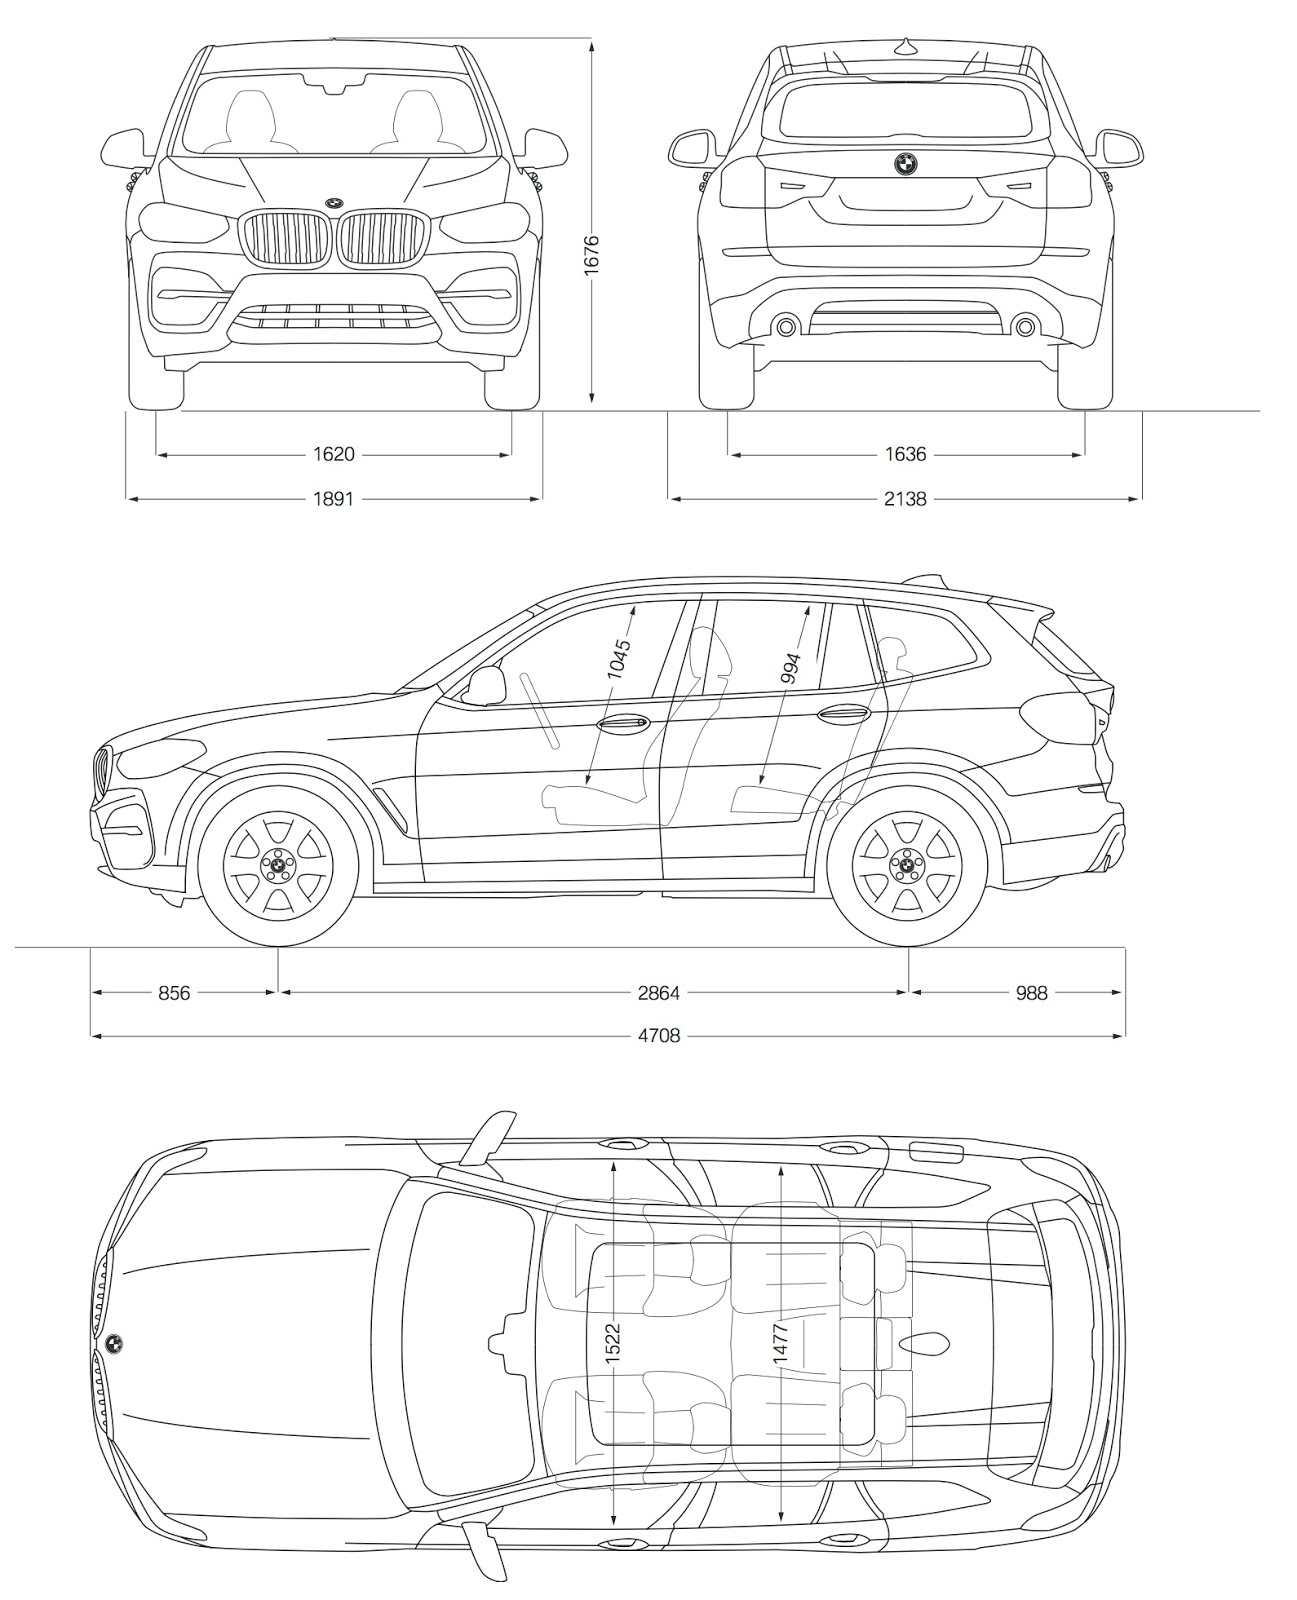 Dimensions Nissan Xtrail And Nissan Qashqai